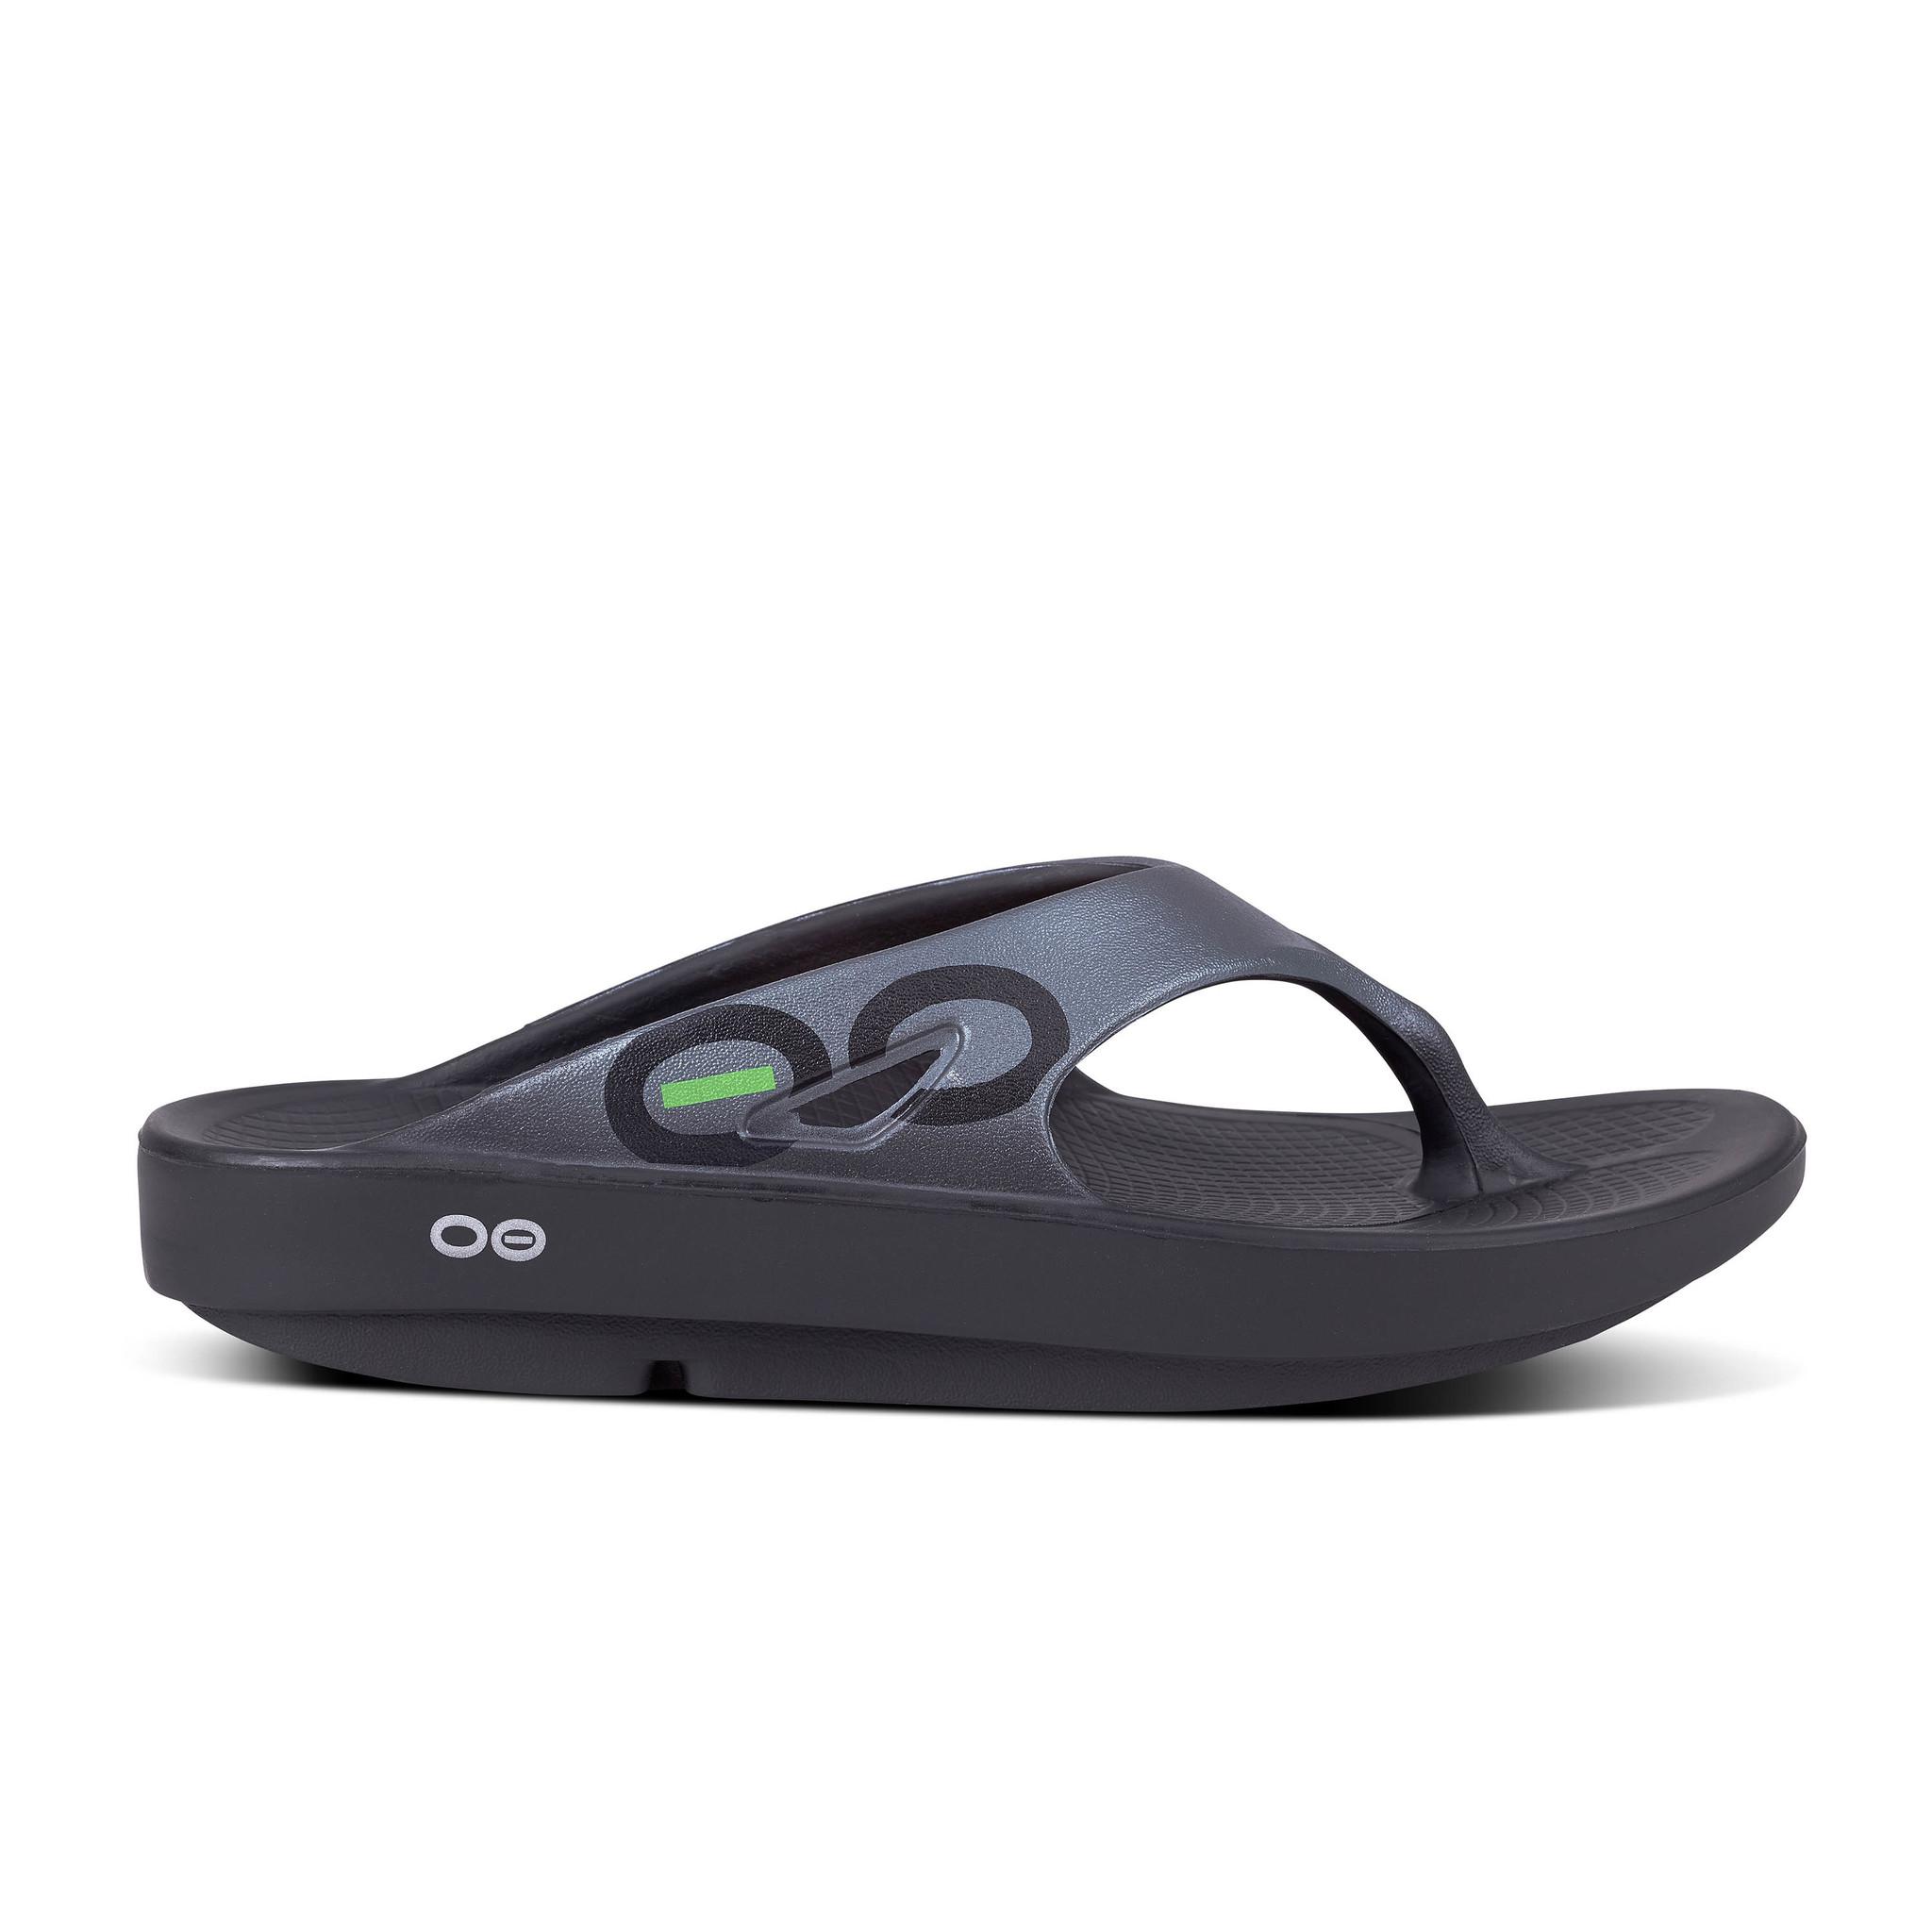 OOfos OOriginal Sport Thong, Graphite/Black